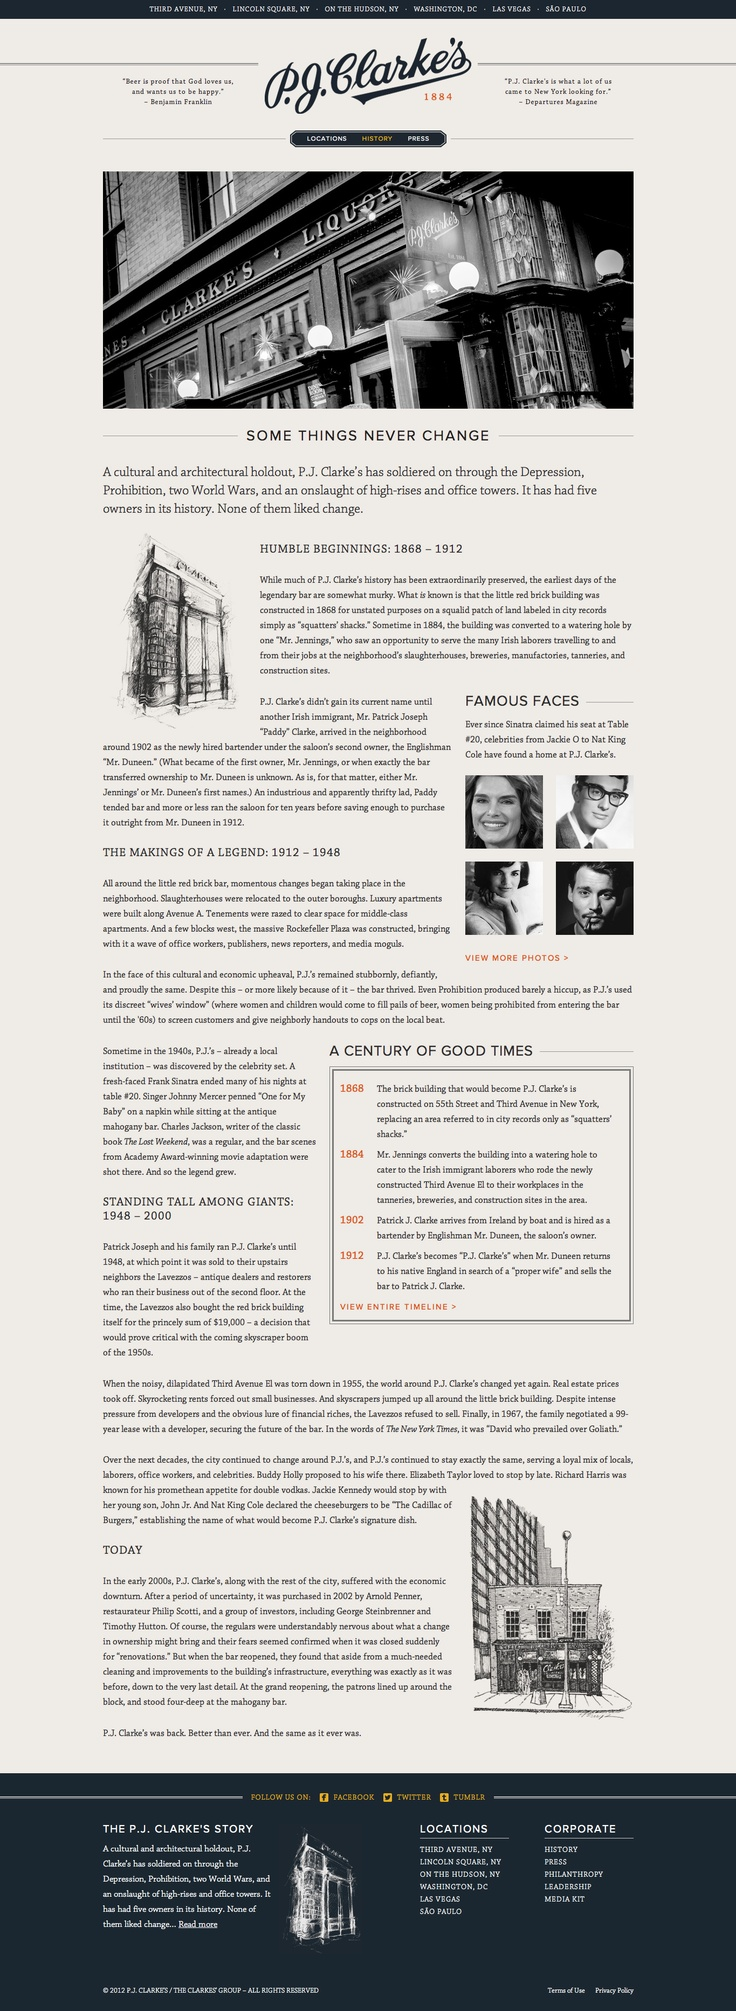 Unique Web Design, P.J. Clarke's #WebDesign #Design (http://www.pinterest.com/aldenchong/)